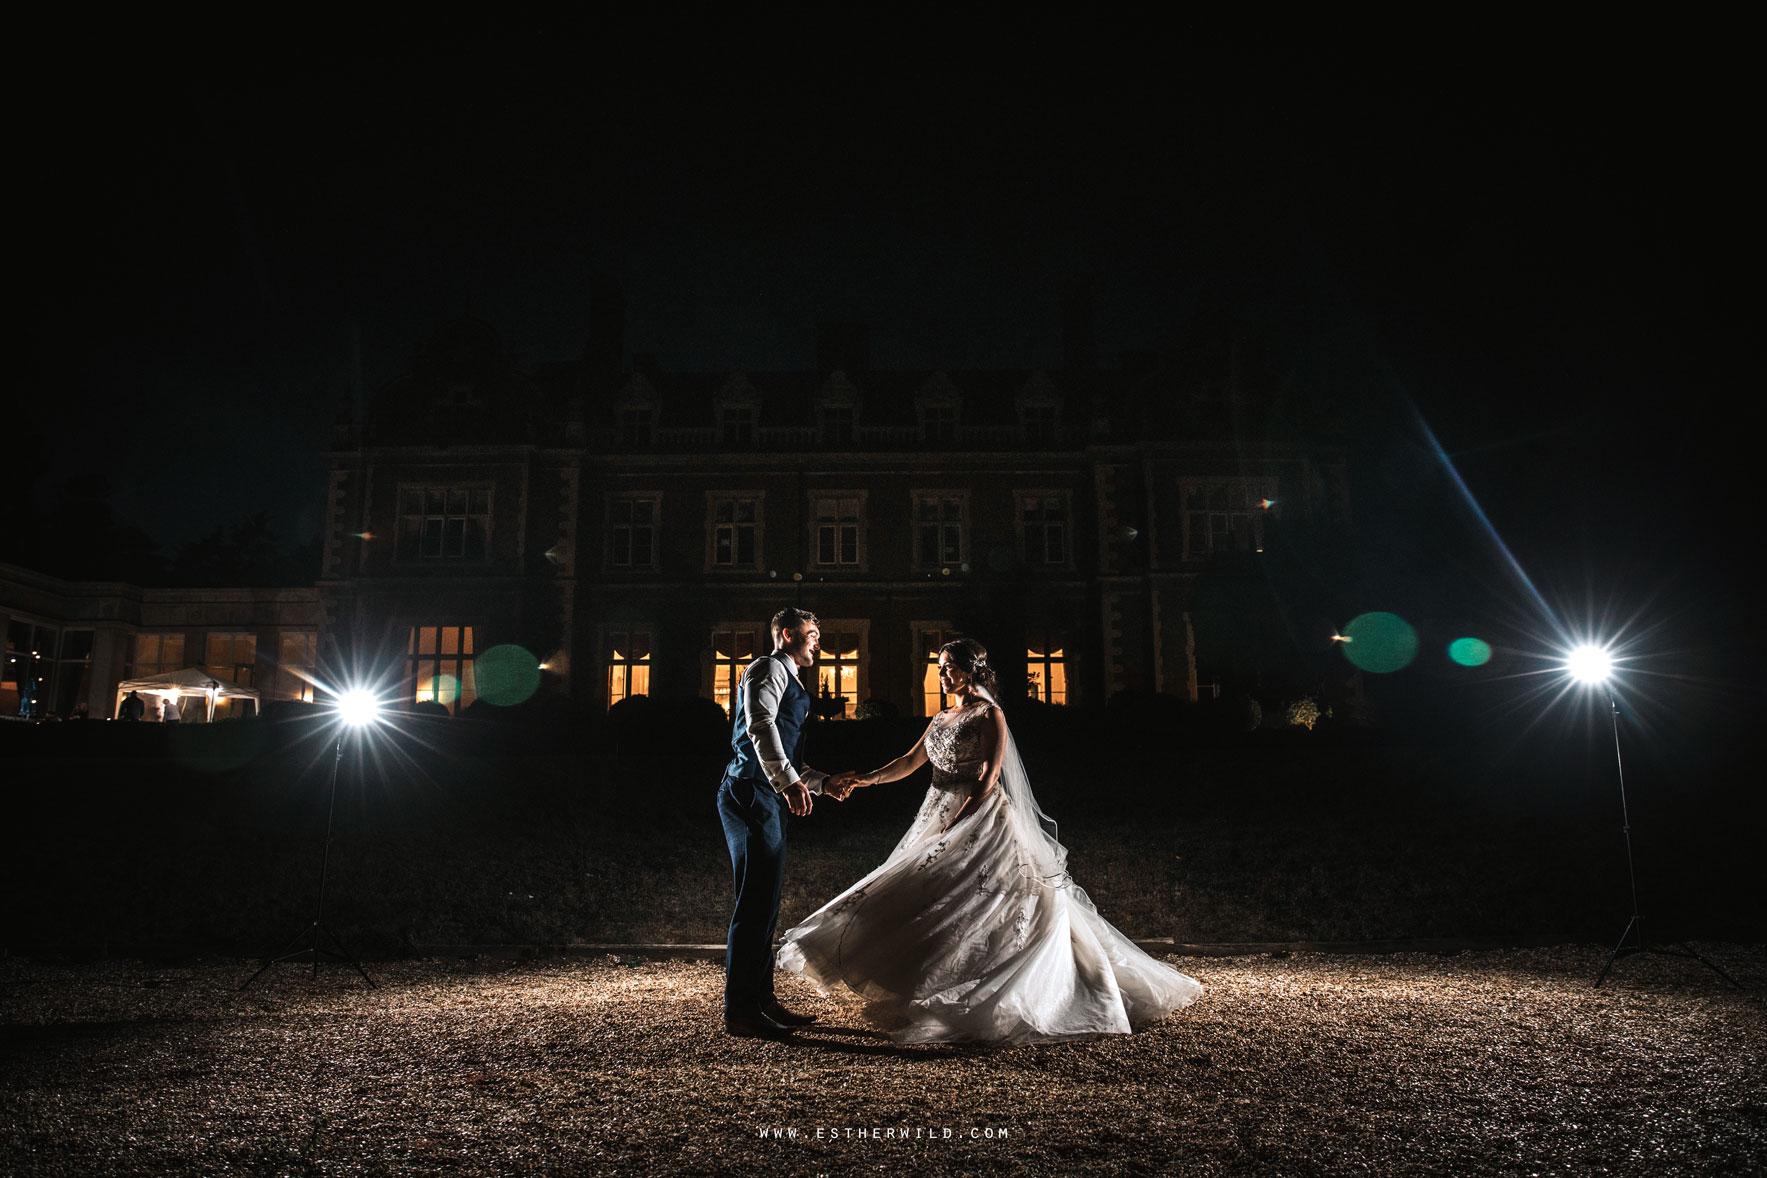 Lynford_Hall_Wedding_Thetford_Mundford_Esther_Wild_Photographer_IMG_3940.jpg